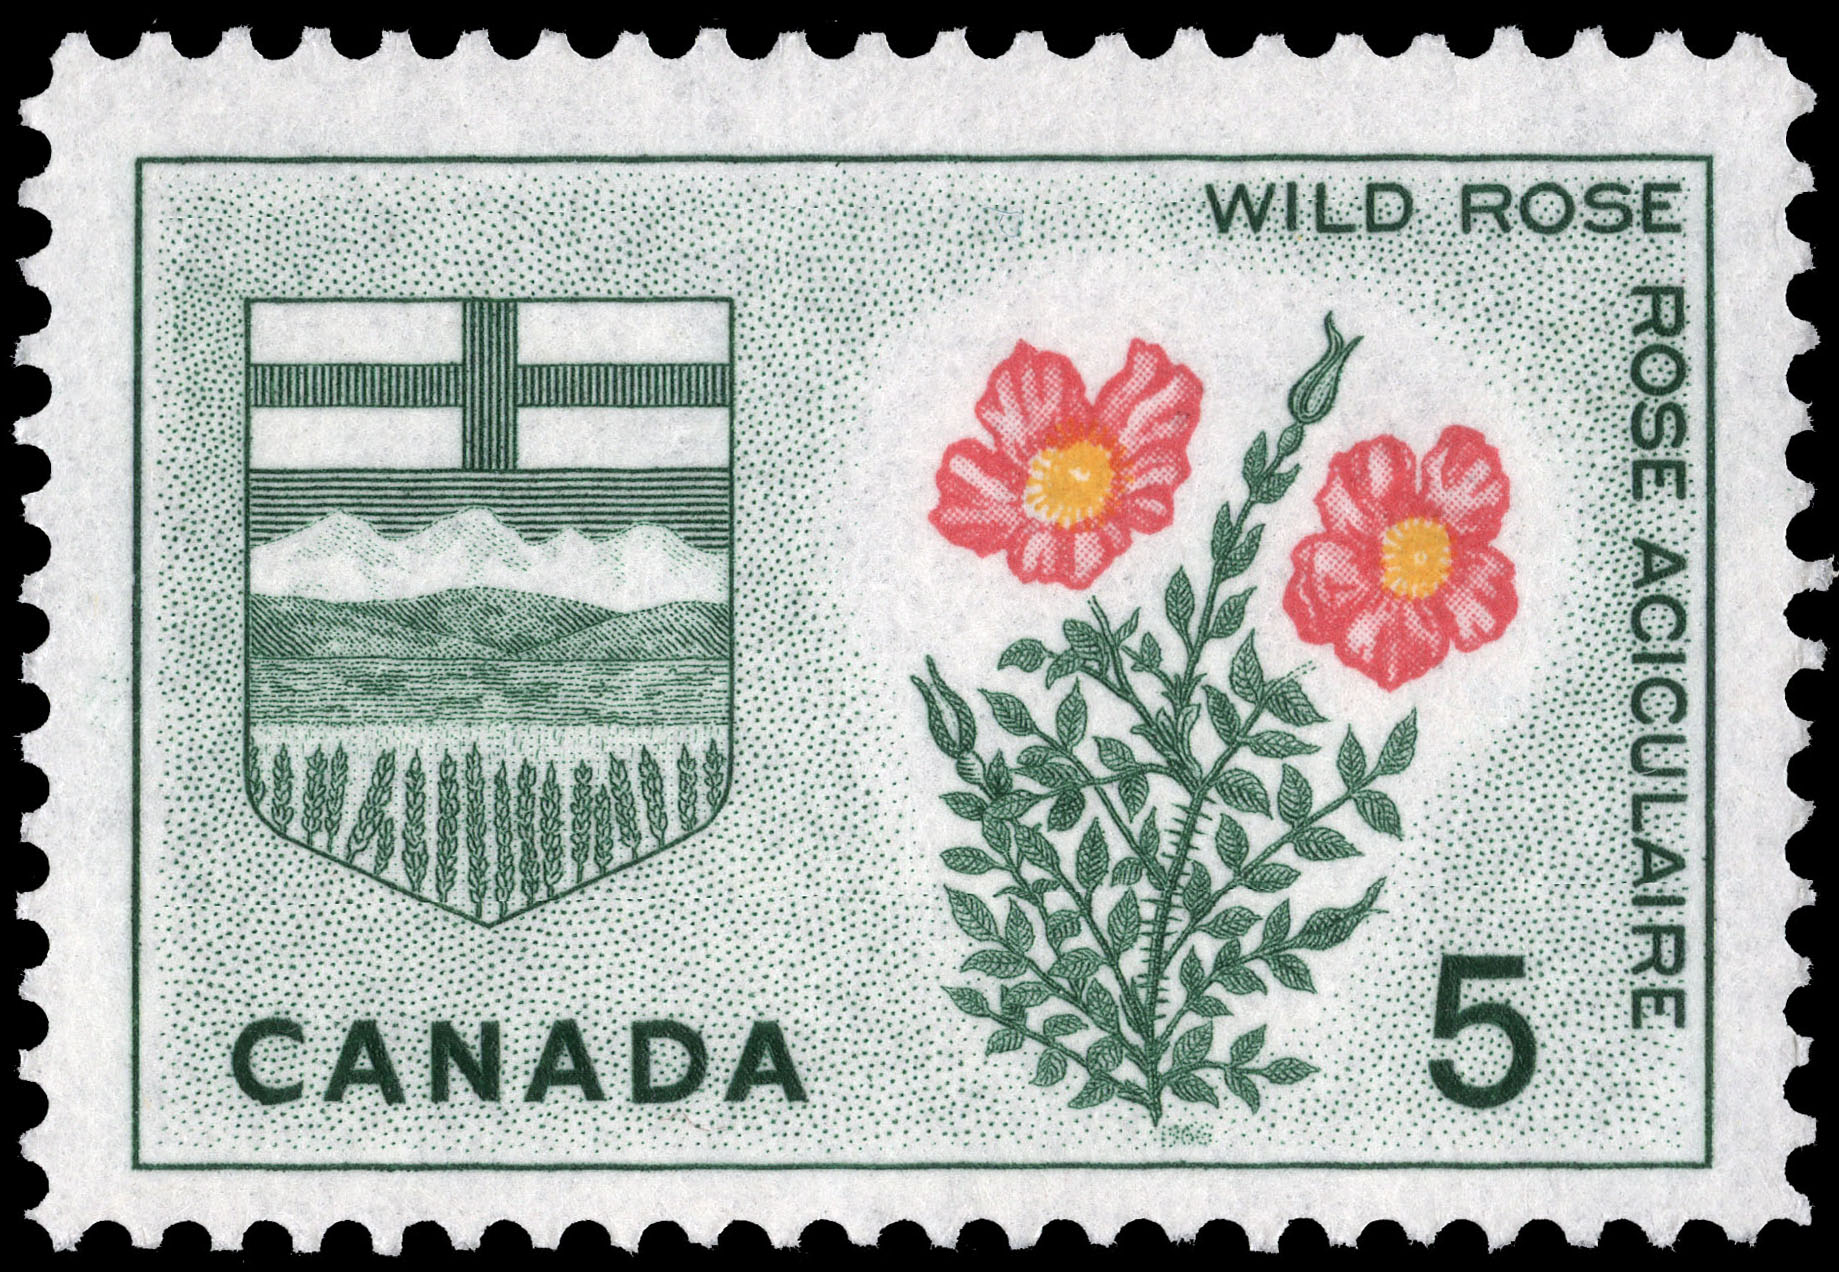 Wild Rose, Alberta Canada Postage Stamp | Floral Emblems